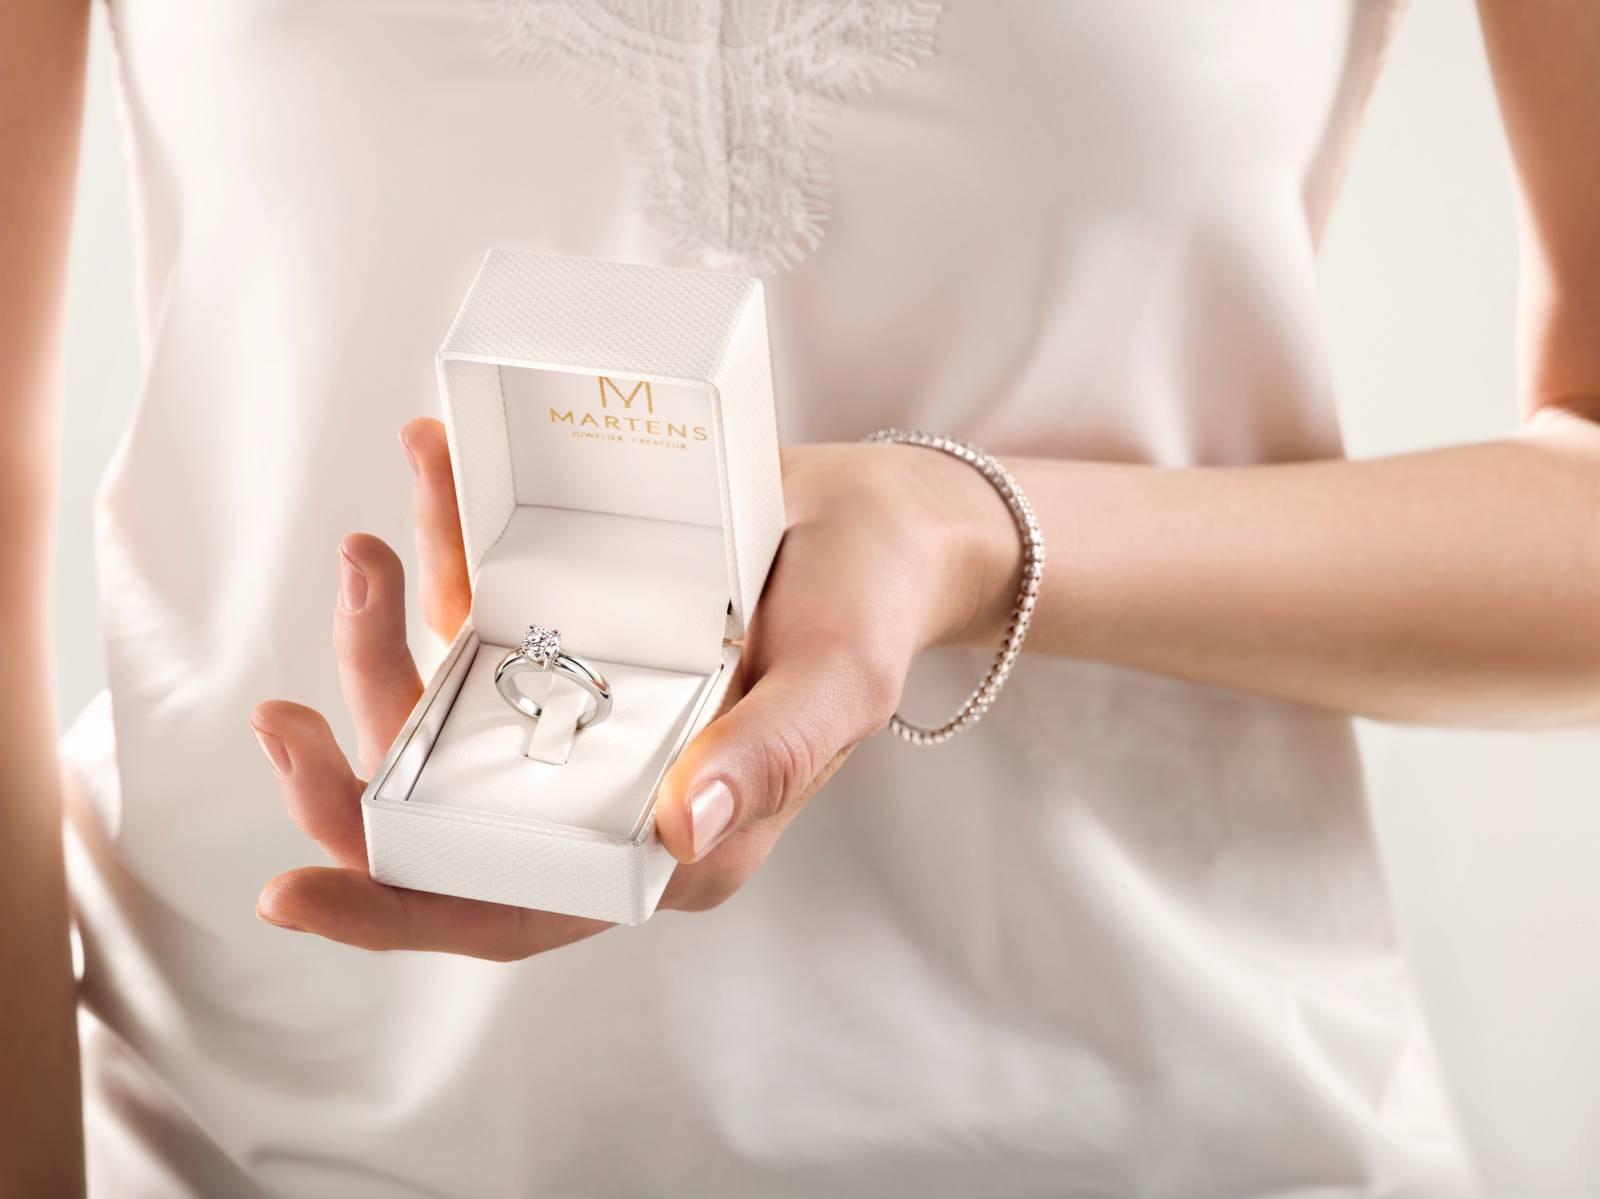 Juwelier Martens - Verlovingsringen - Trouwringen - Juwelen huwelijk - House of Weddings - 9